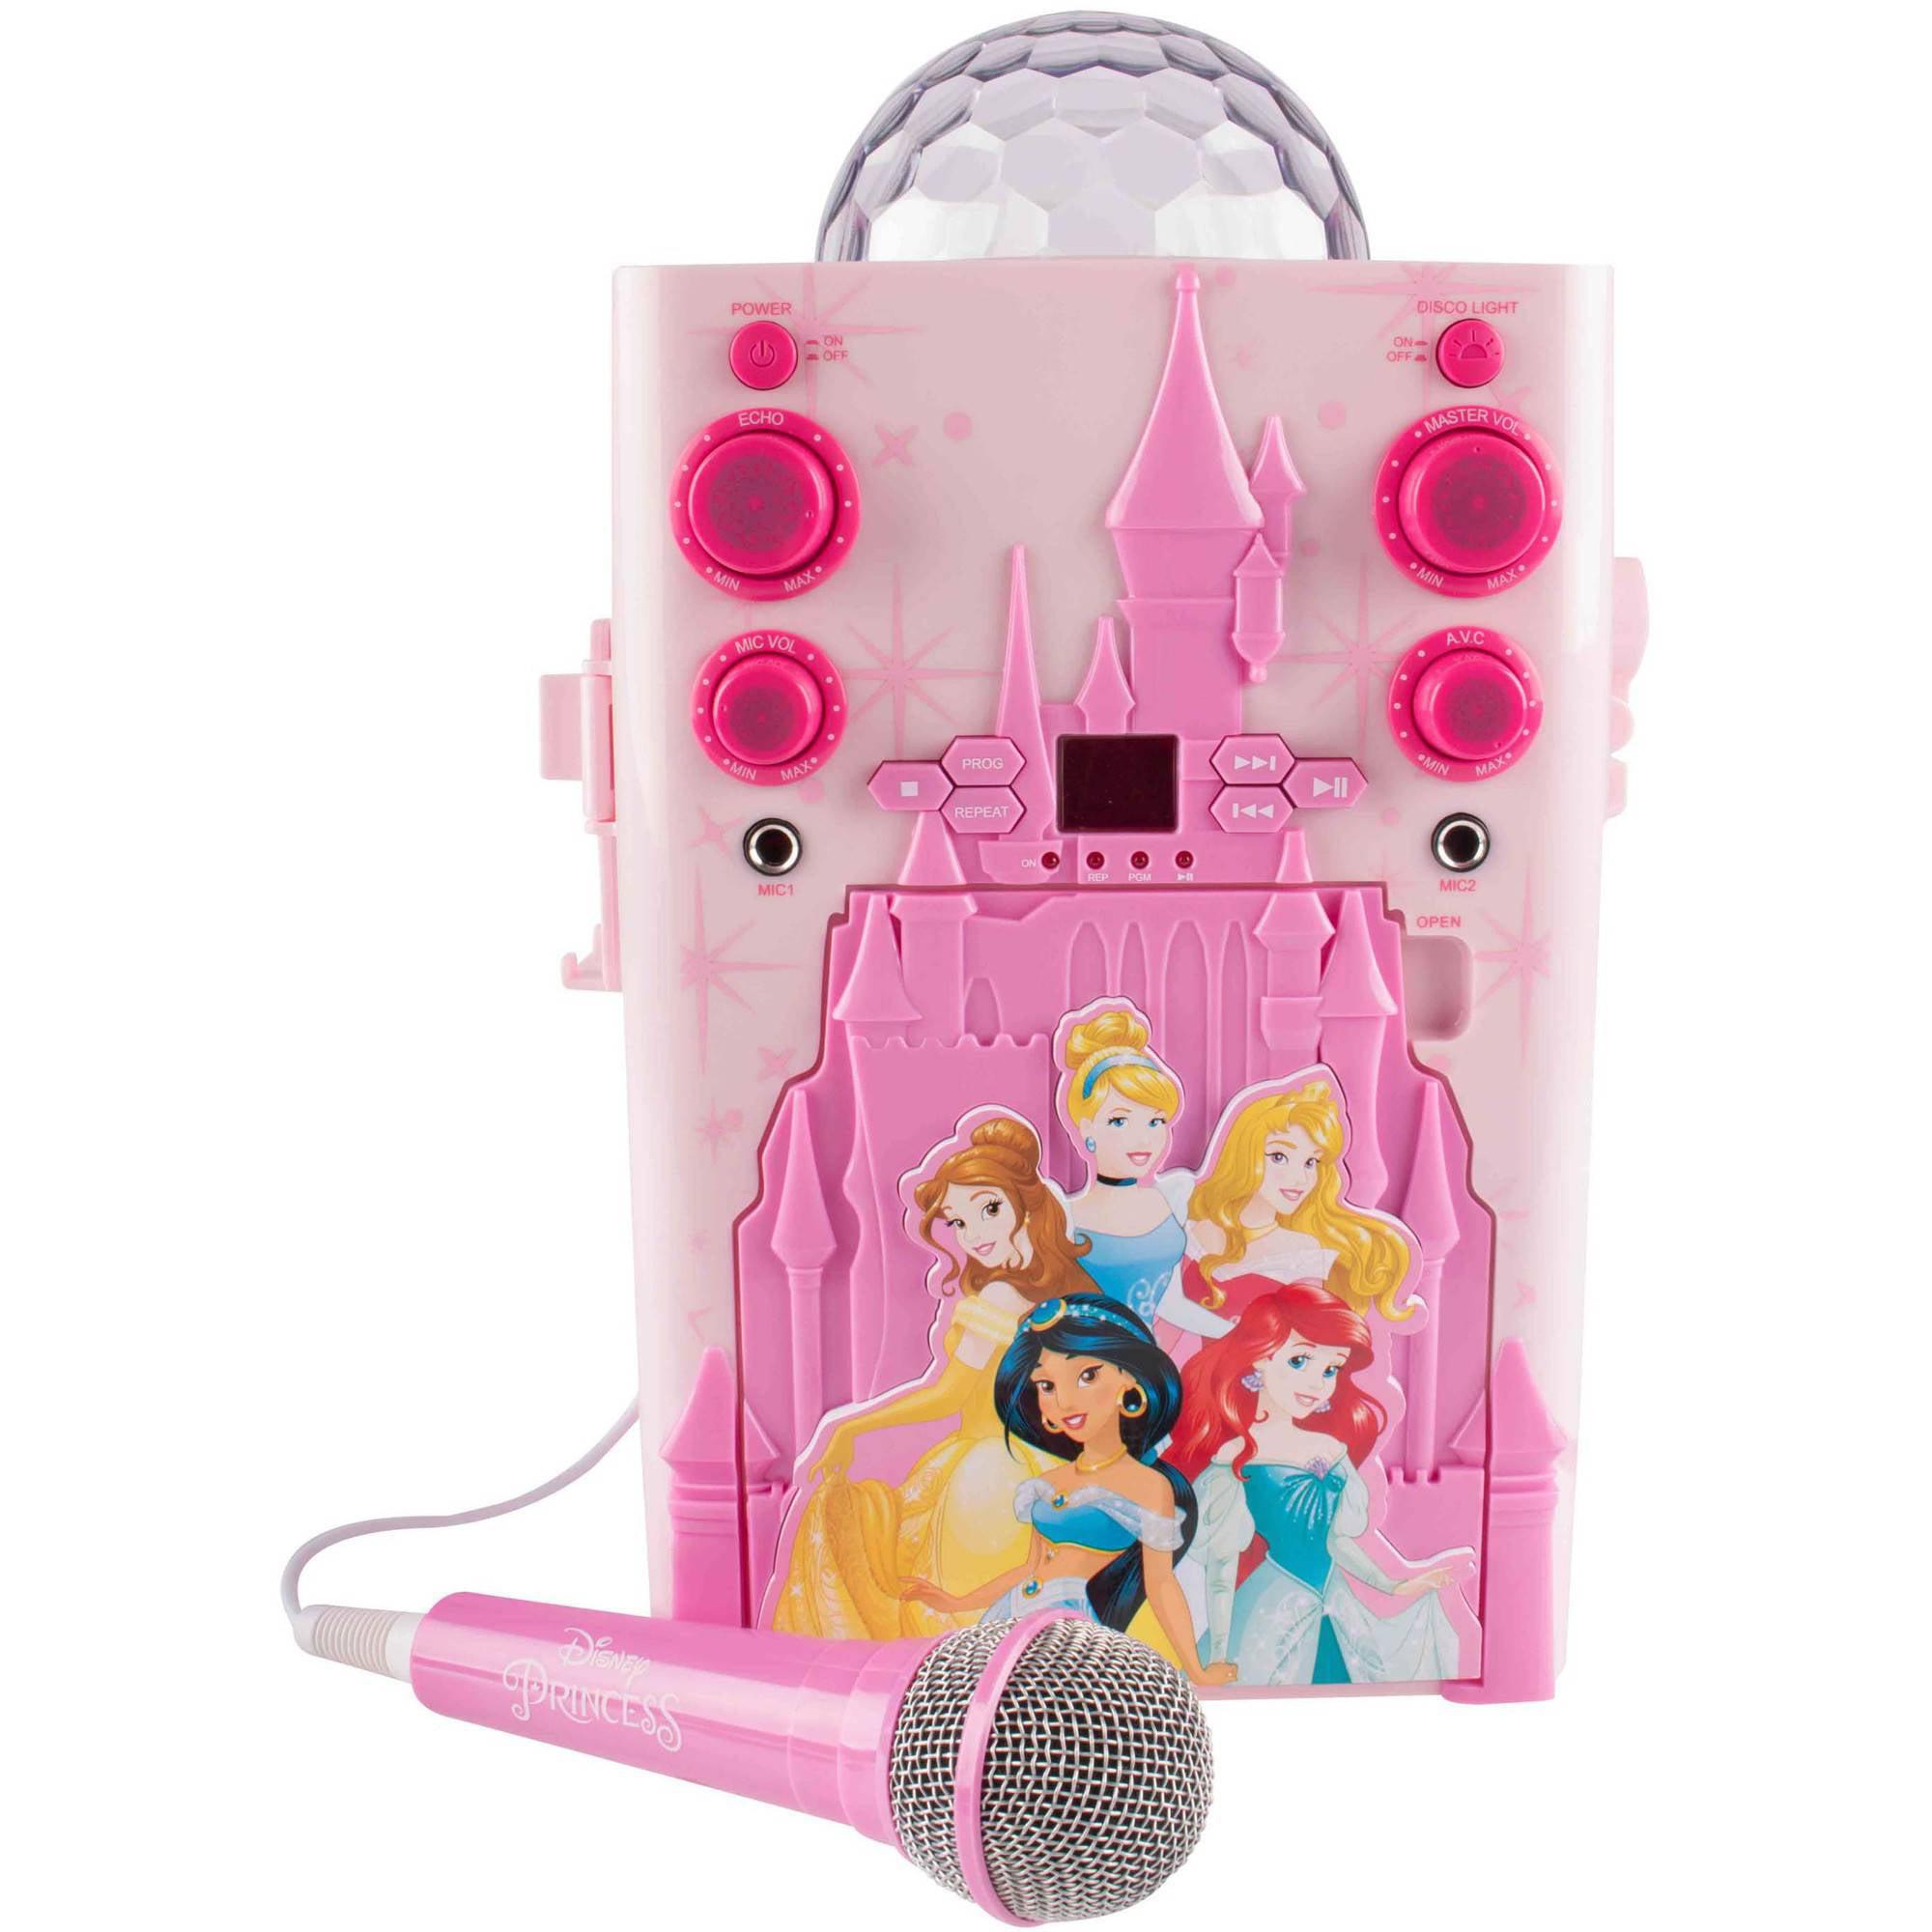 Disney Princess Princess Royal Ball Karaoke by Sakar International